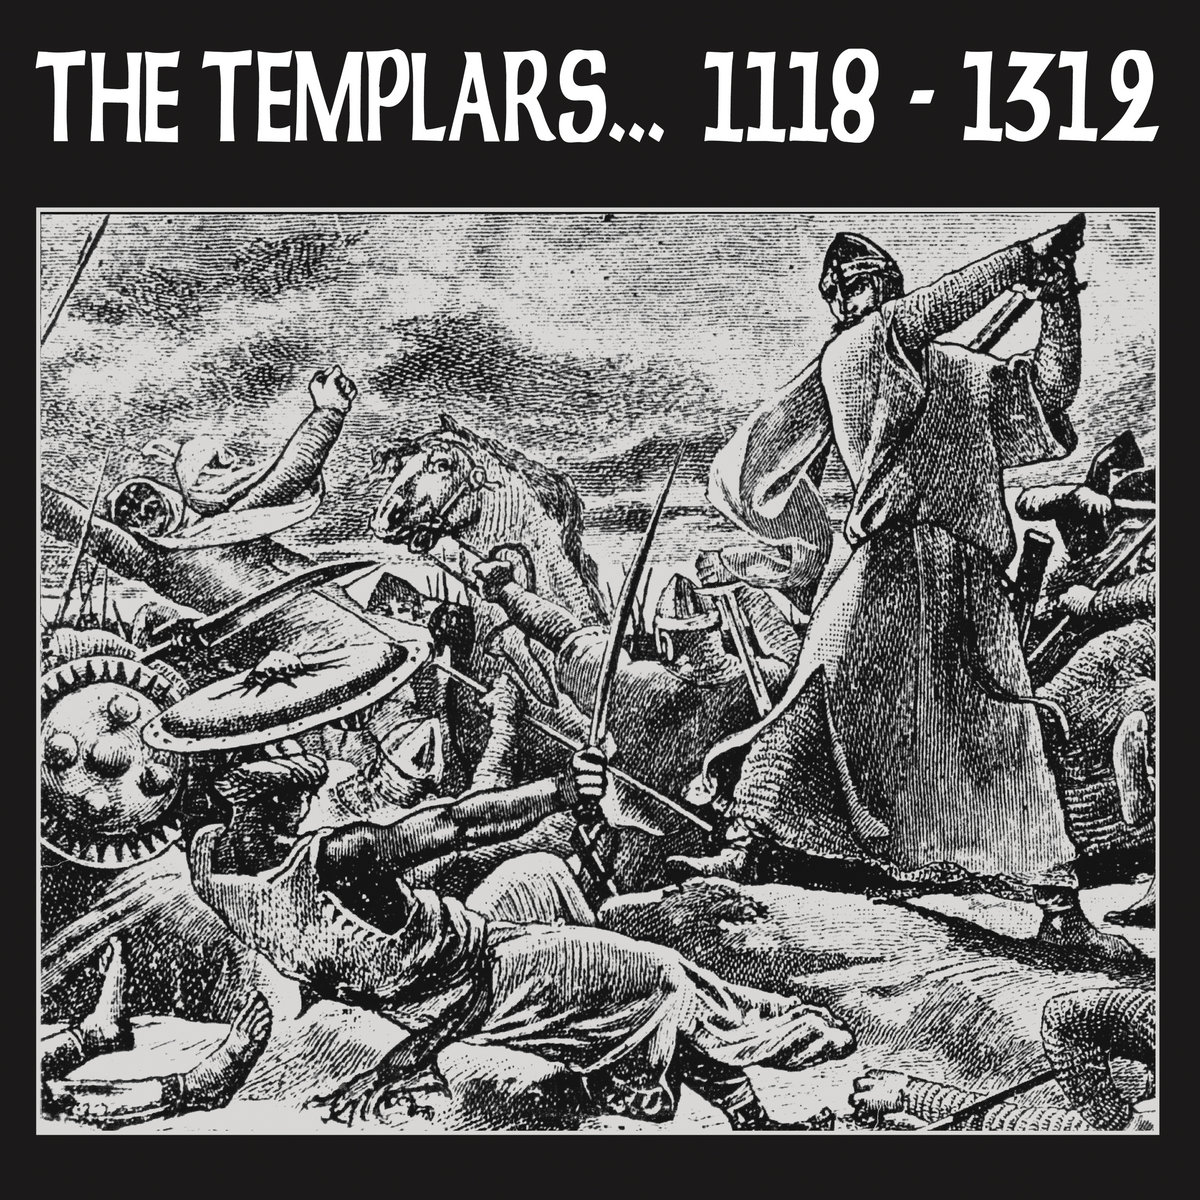 1118-1312   The Templars